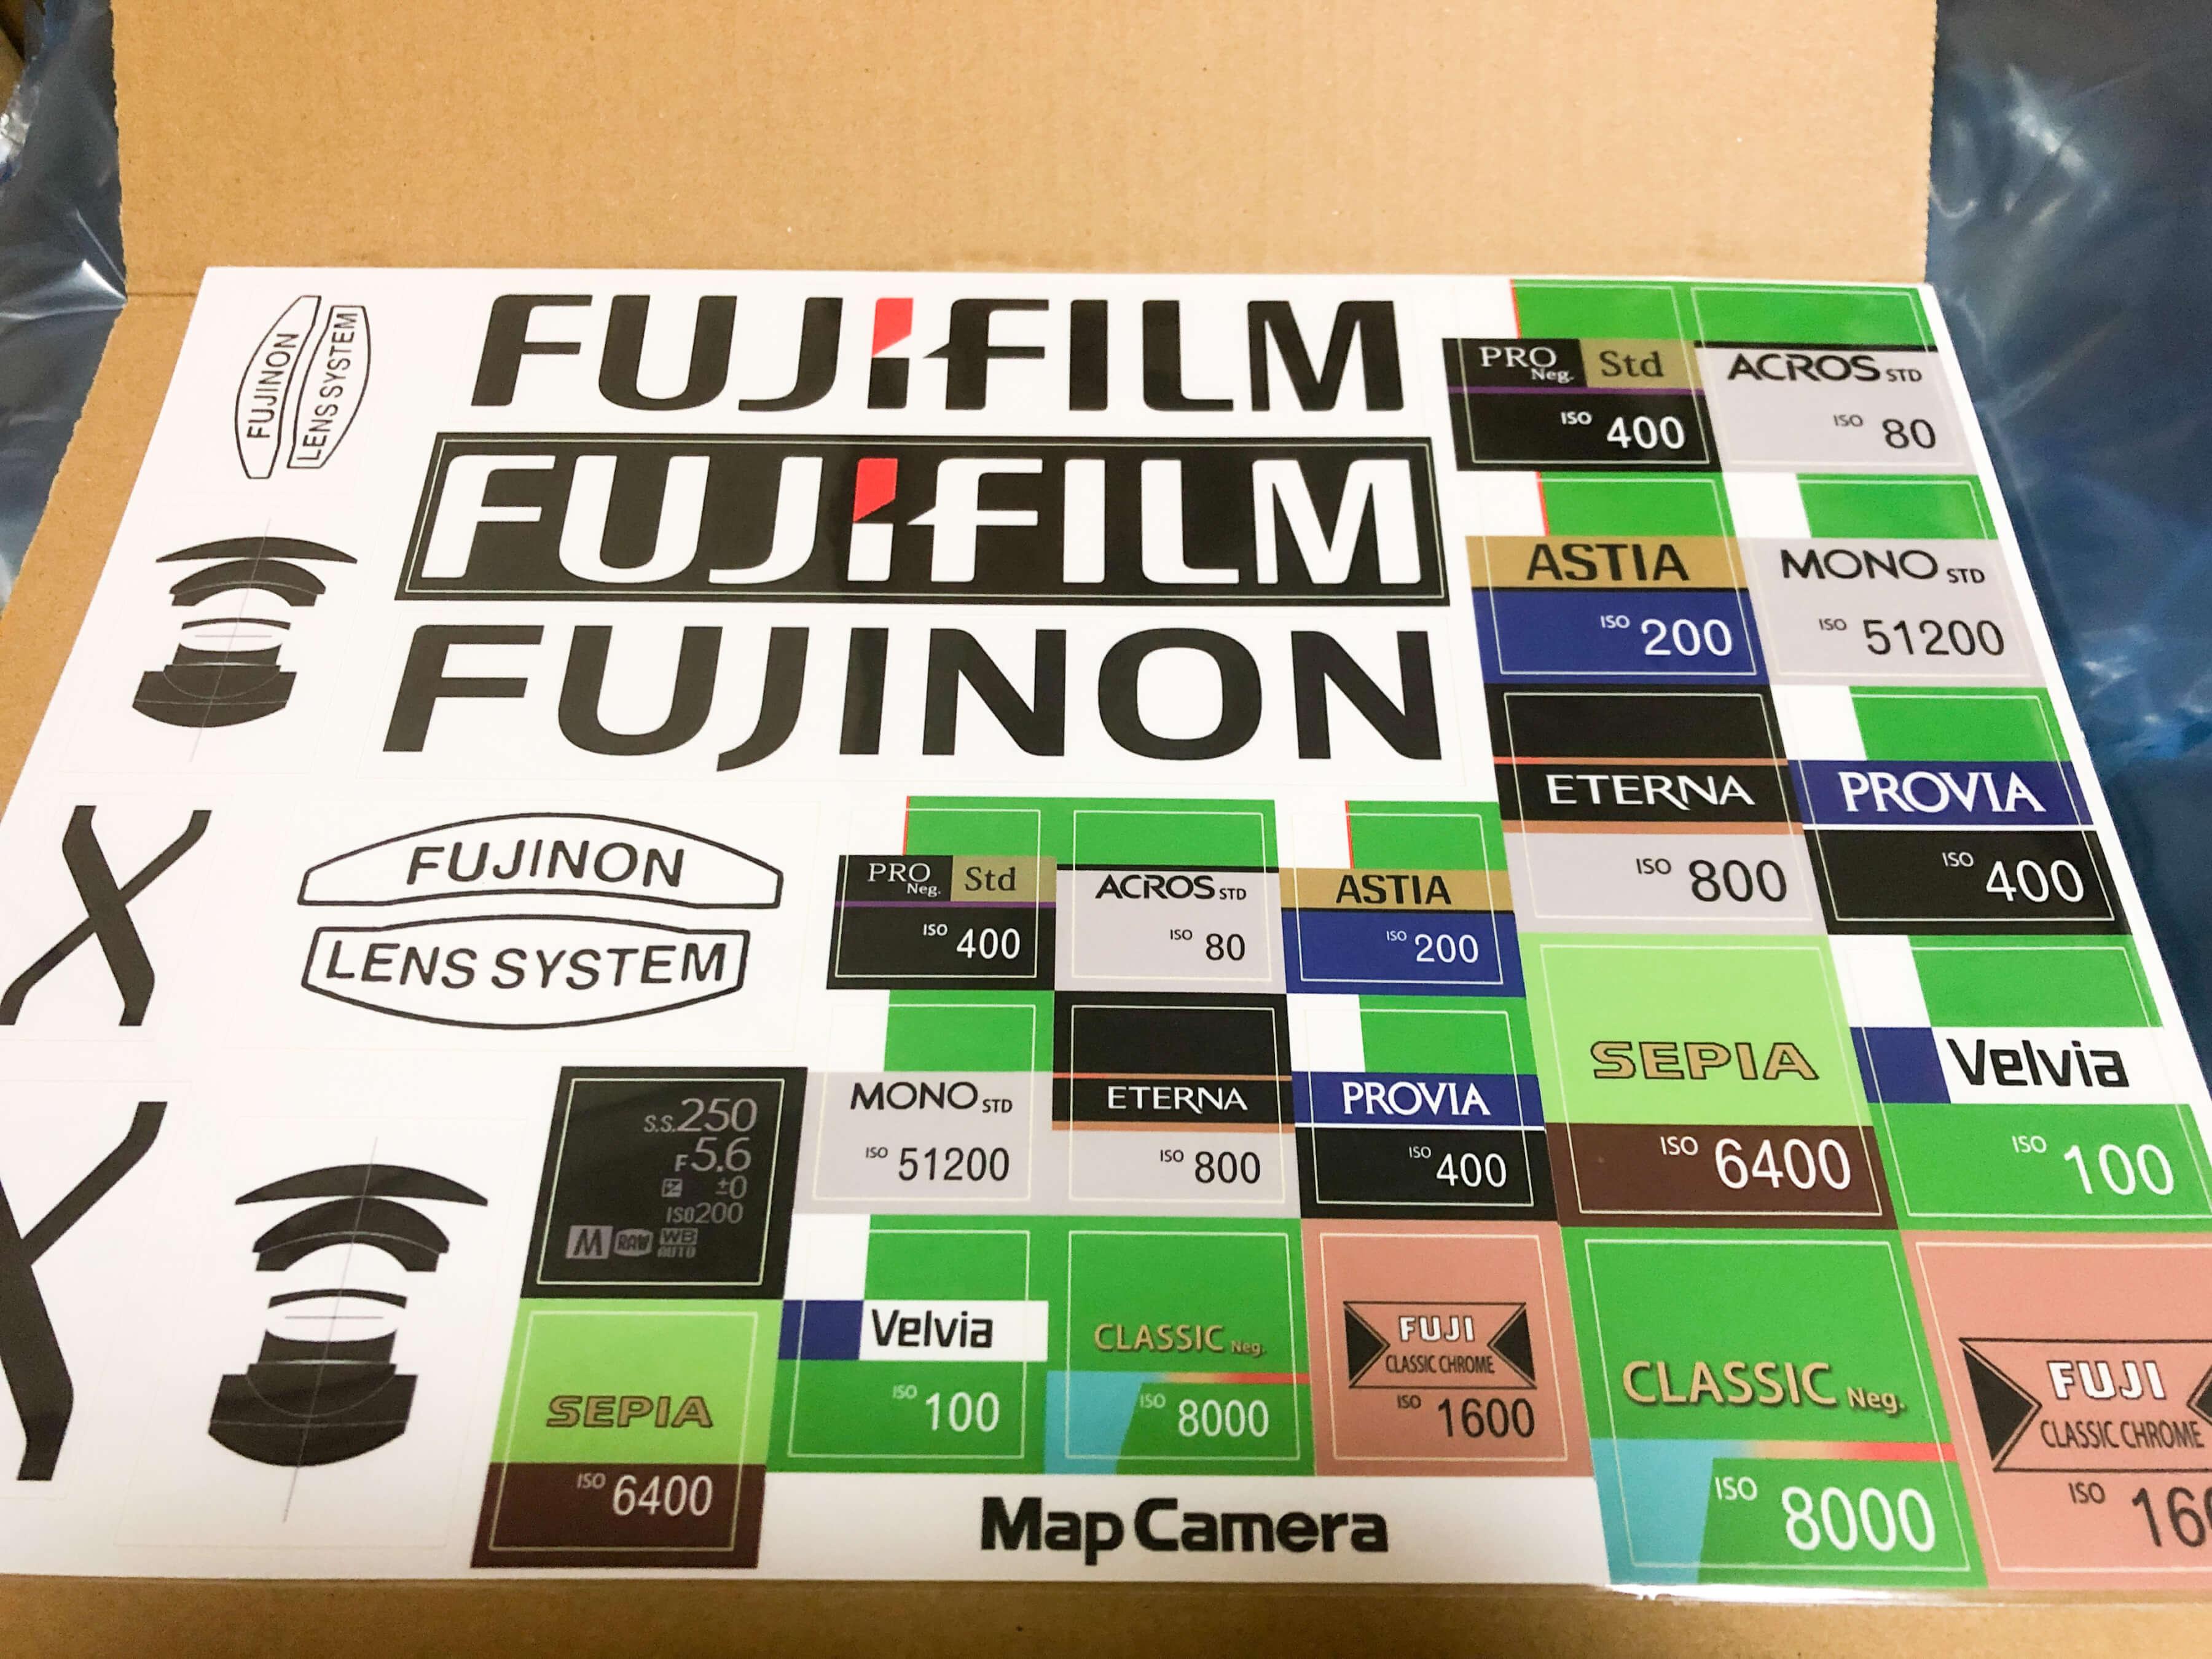 FUJIFILM GFX50Sを手放して新しいカメラを買いました